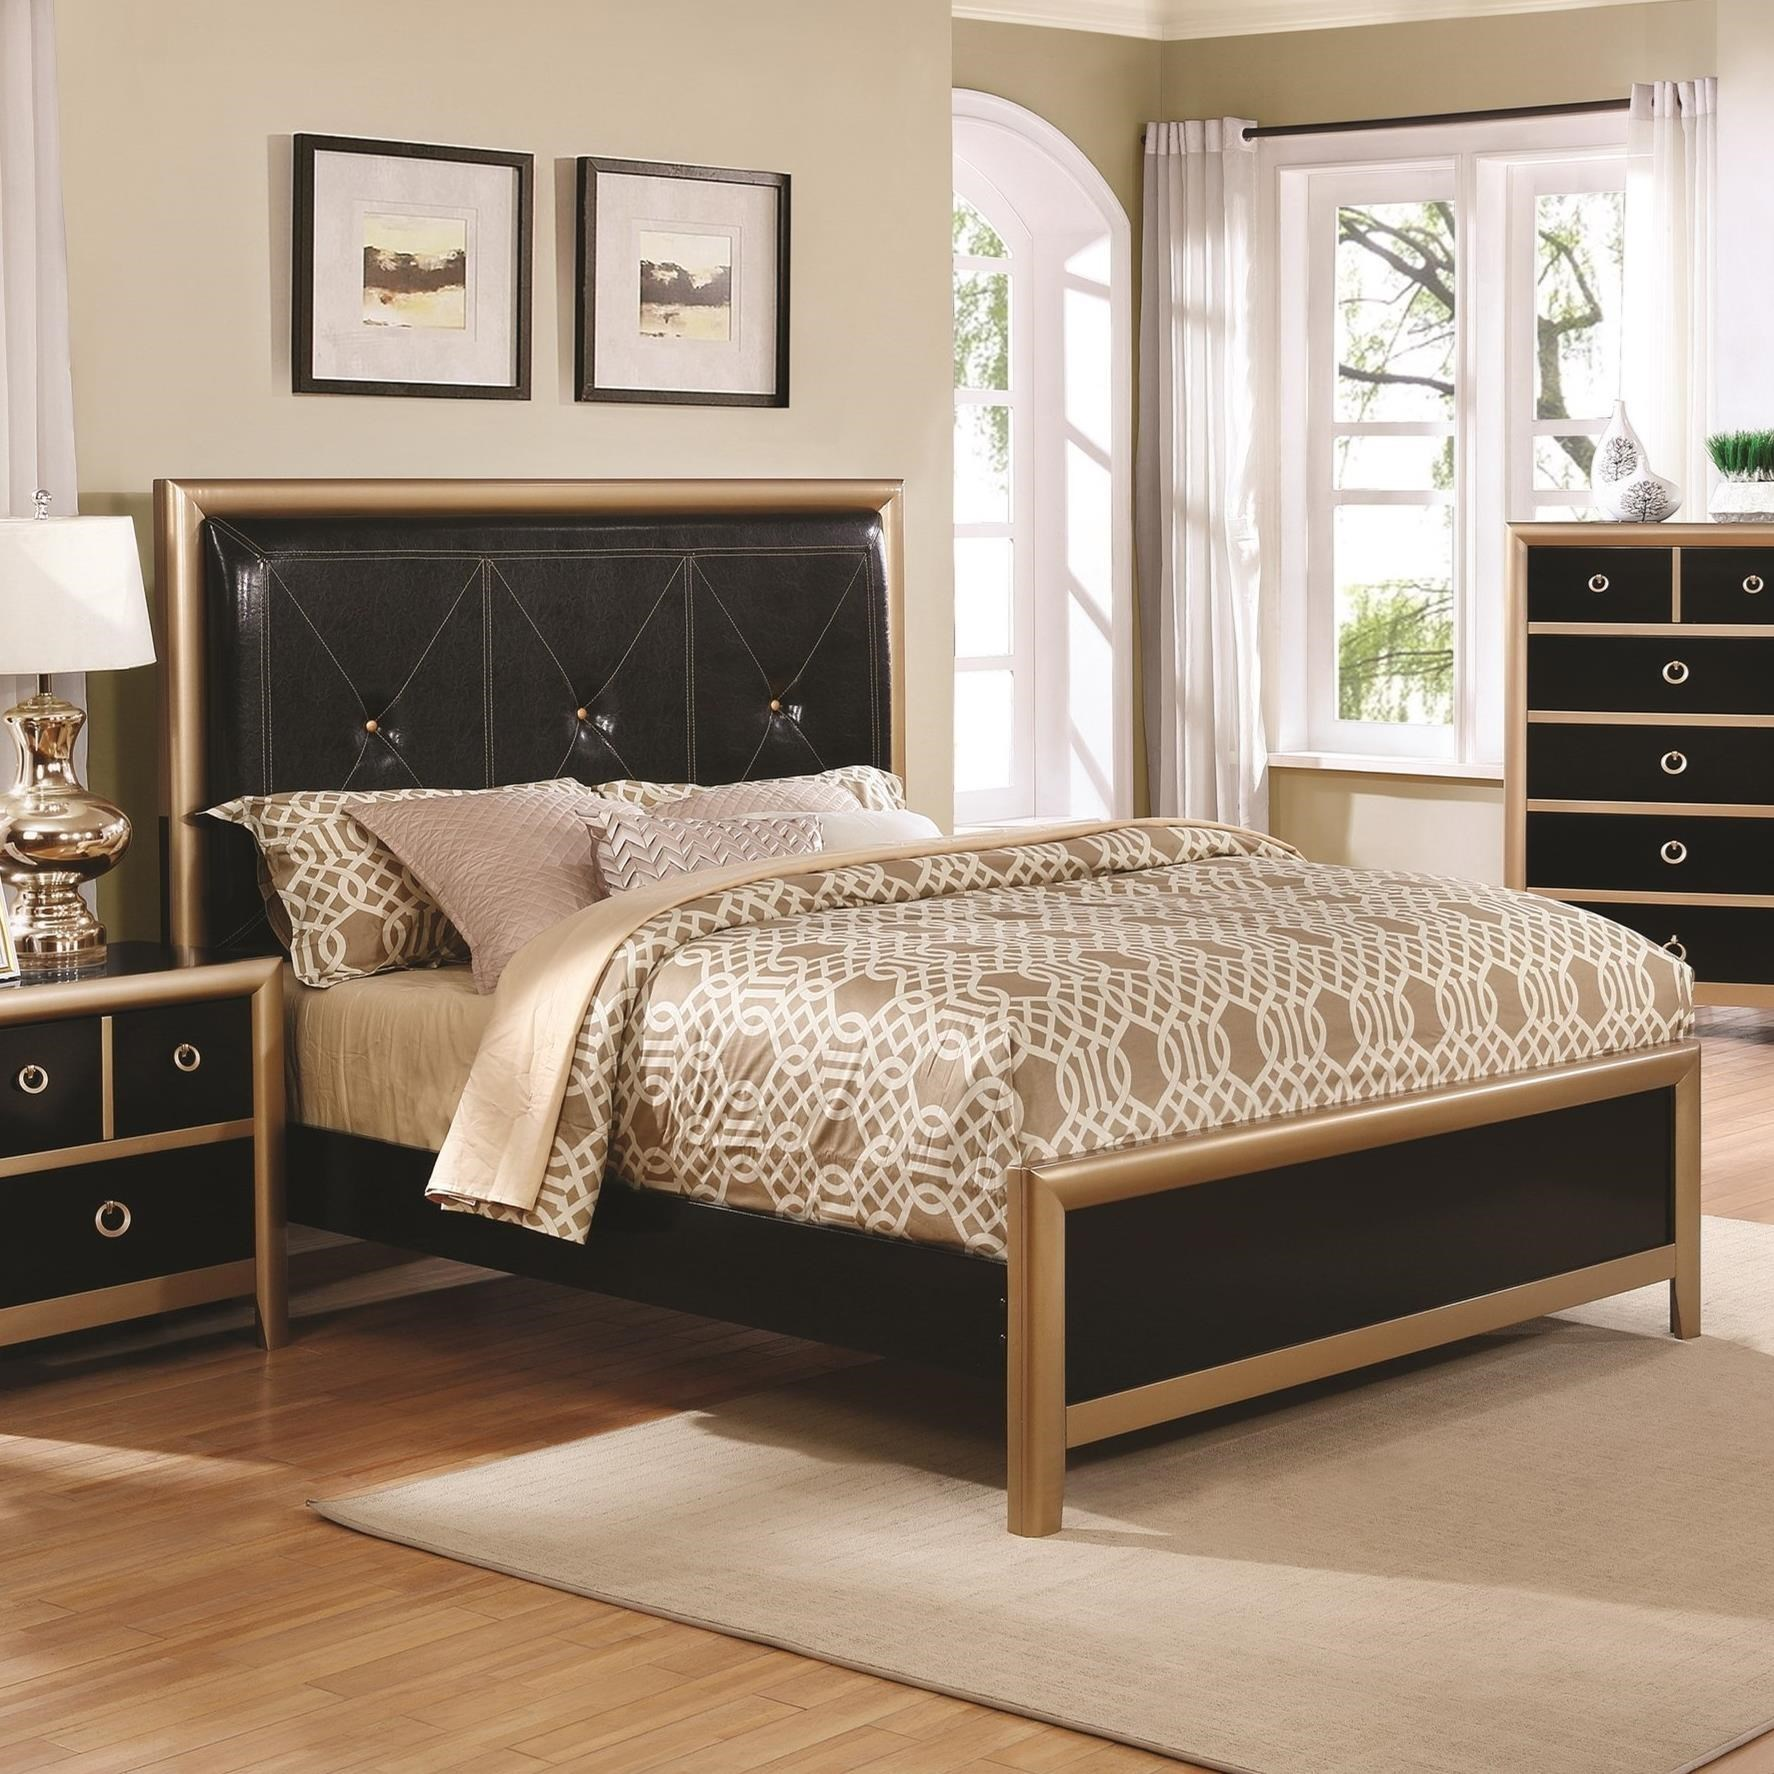 Coaster Zovatto King Bed - Item Number: 205341KE